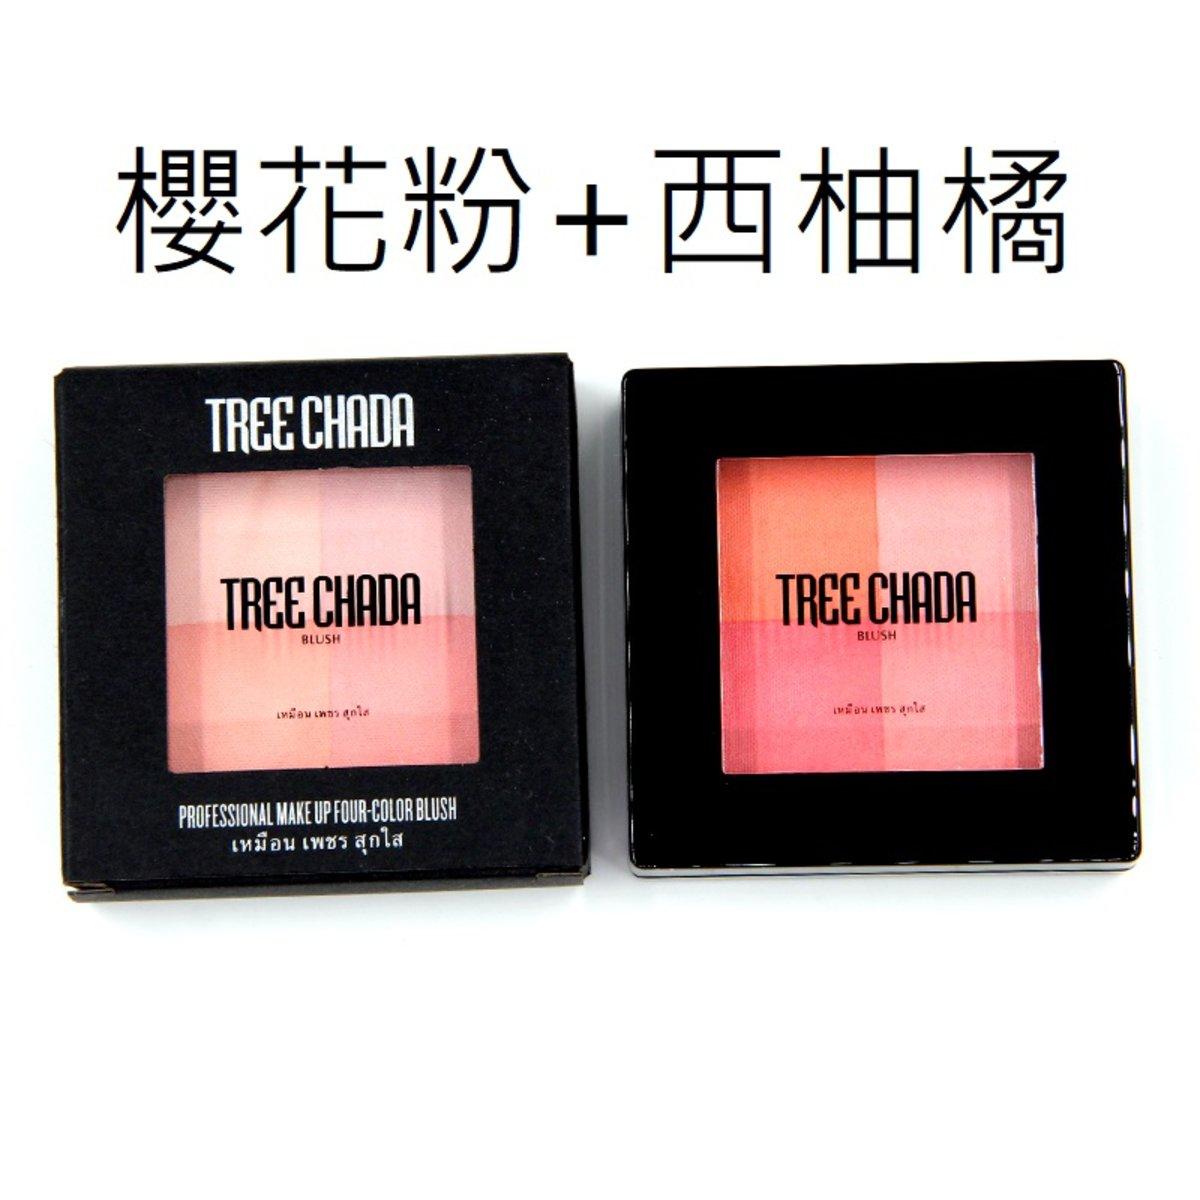 Blend Natural Four-color plaid blush S2 grapefruit orange 7g + S1 Cherry blossom 7g